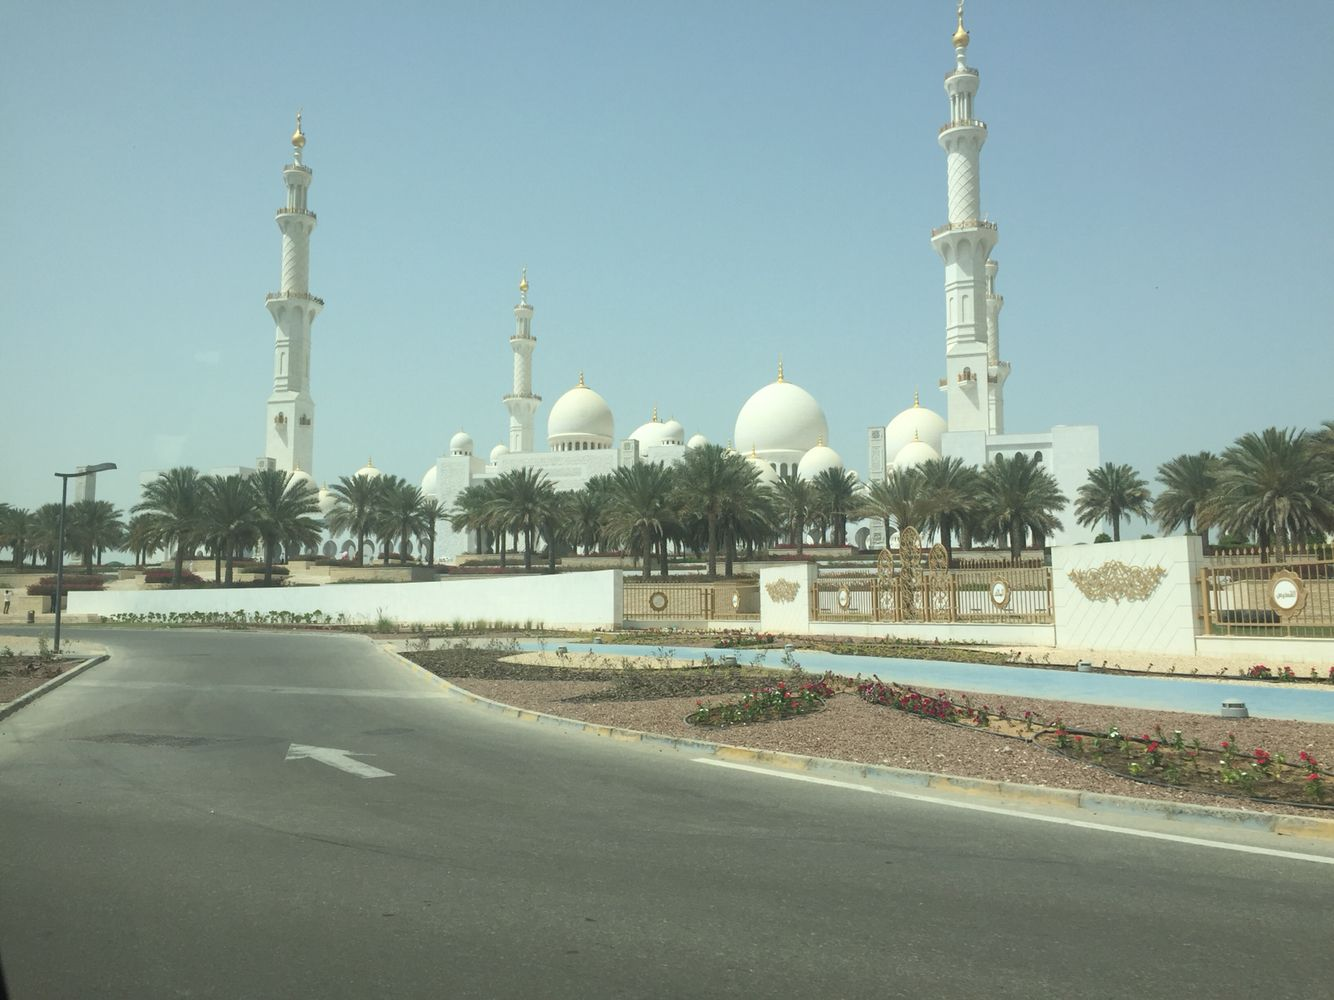 Sheikh Zayed Grand mosque. Abu Dhabi